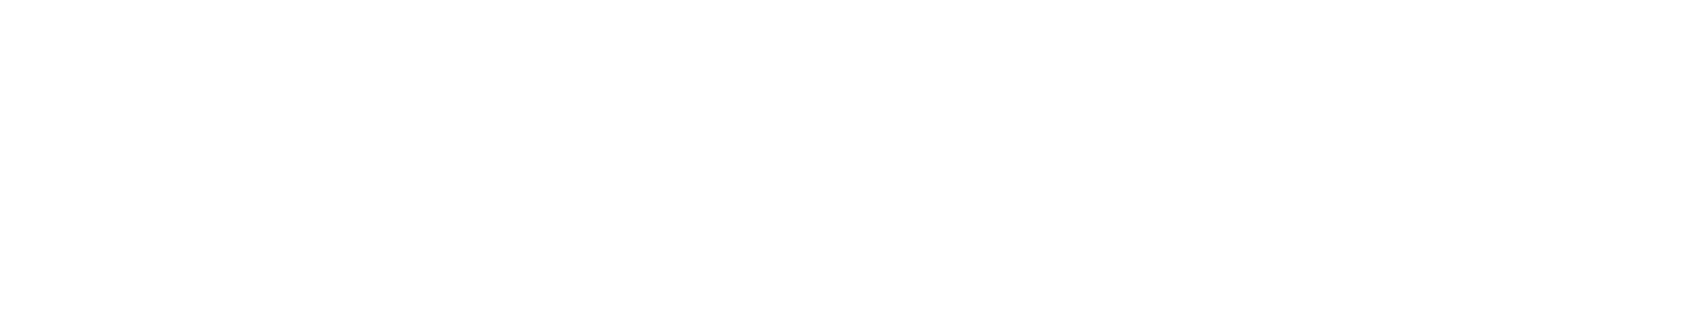 candor-web-subscription-copy-NRO.png